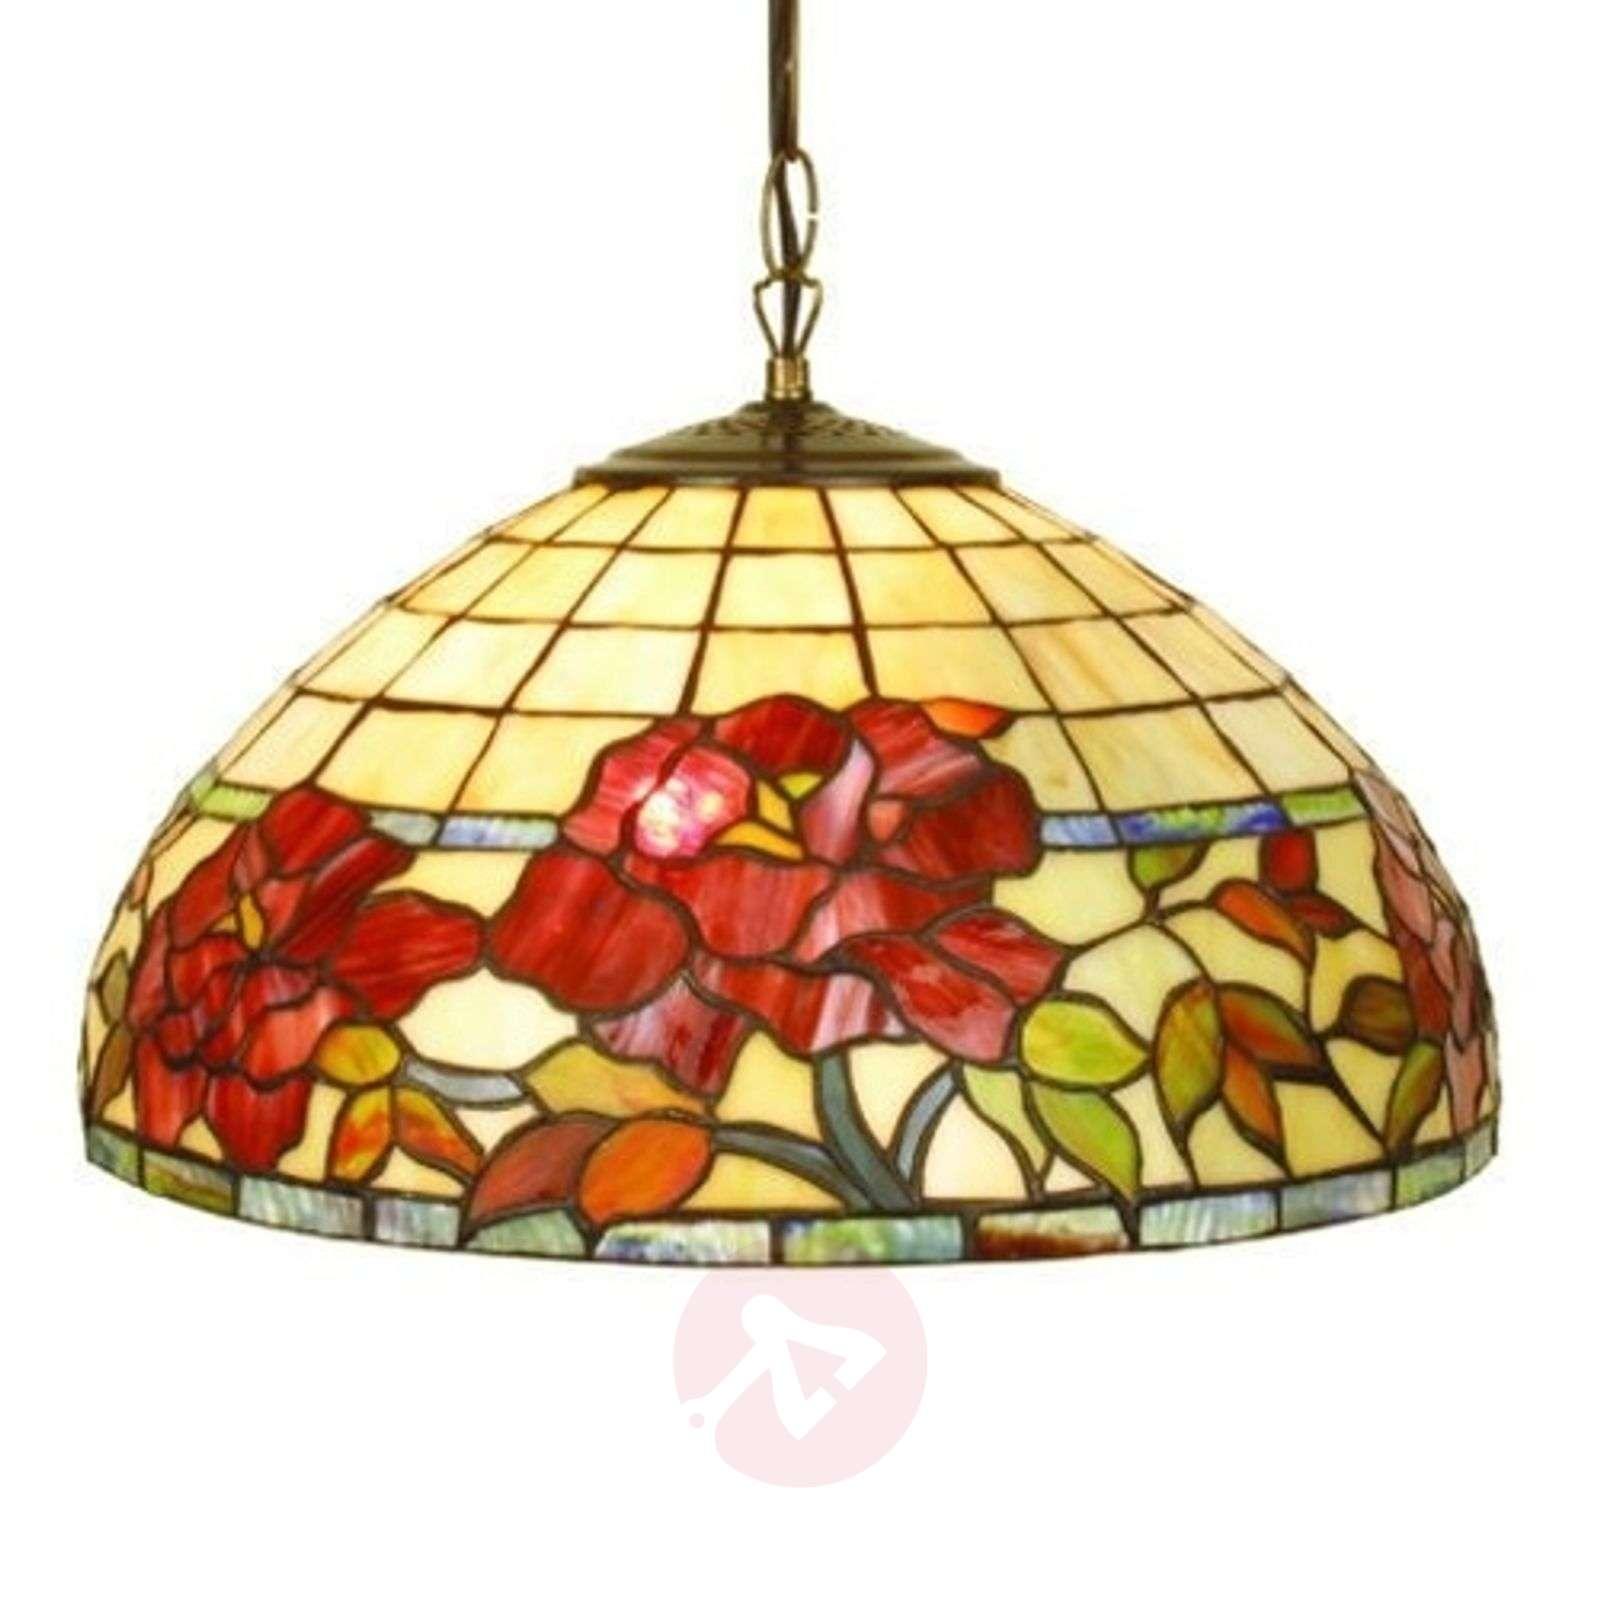 ESMEE ornate hanging light, 2-bulb-1032173-01